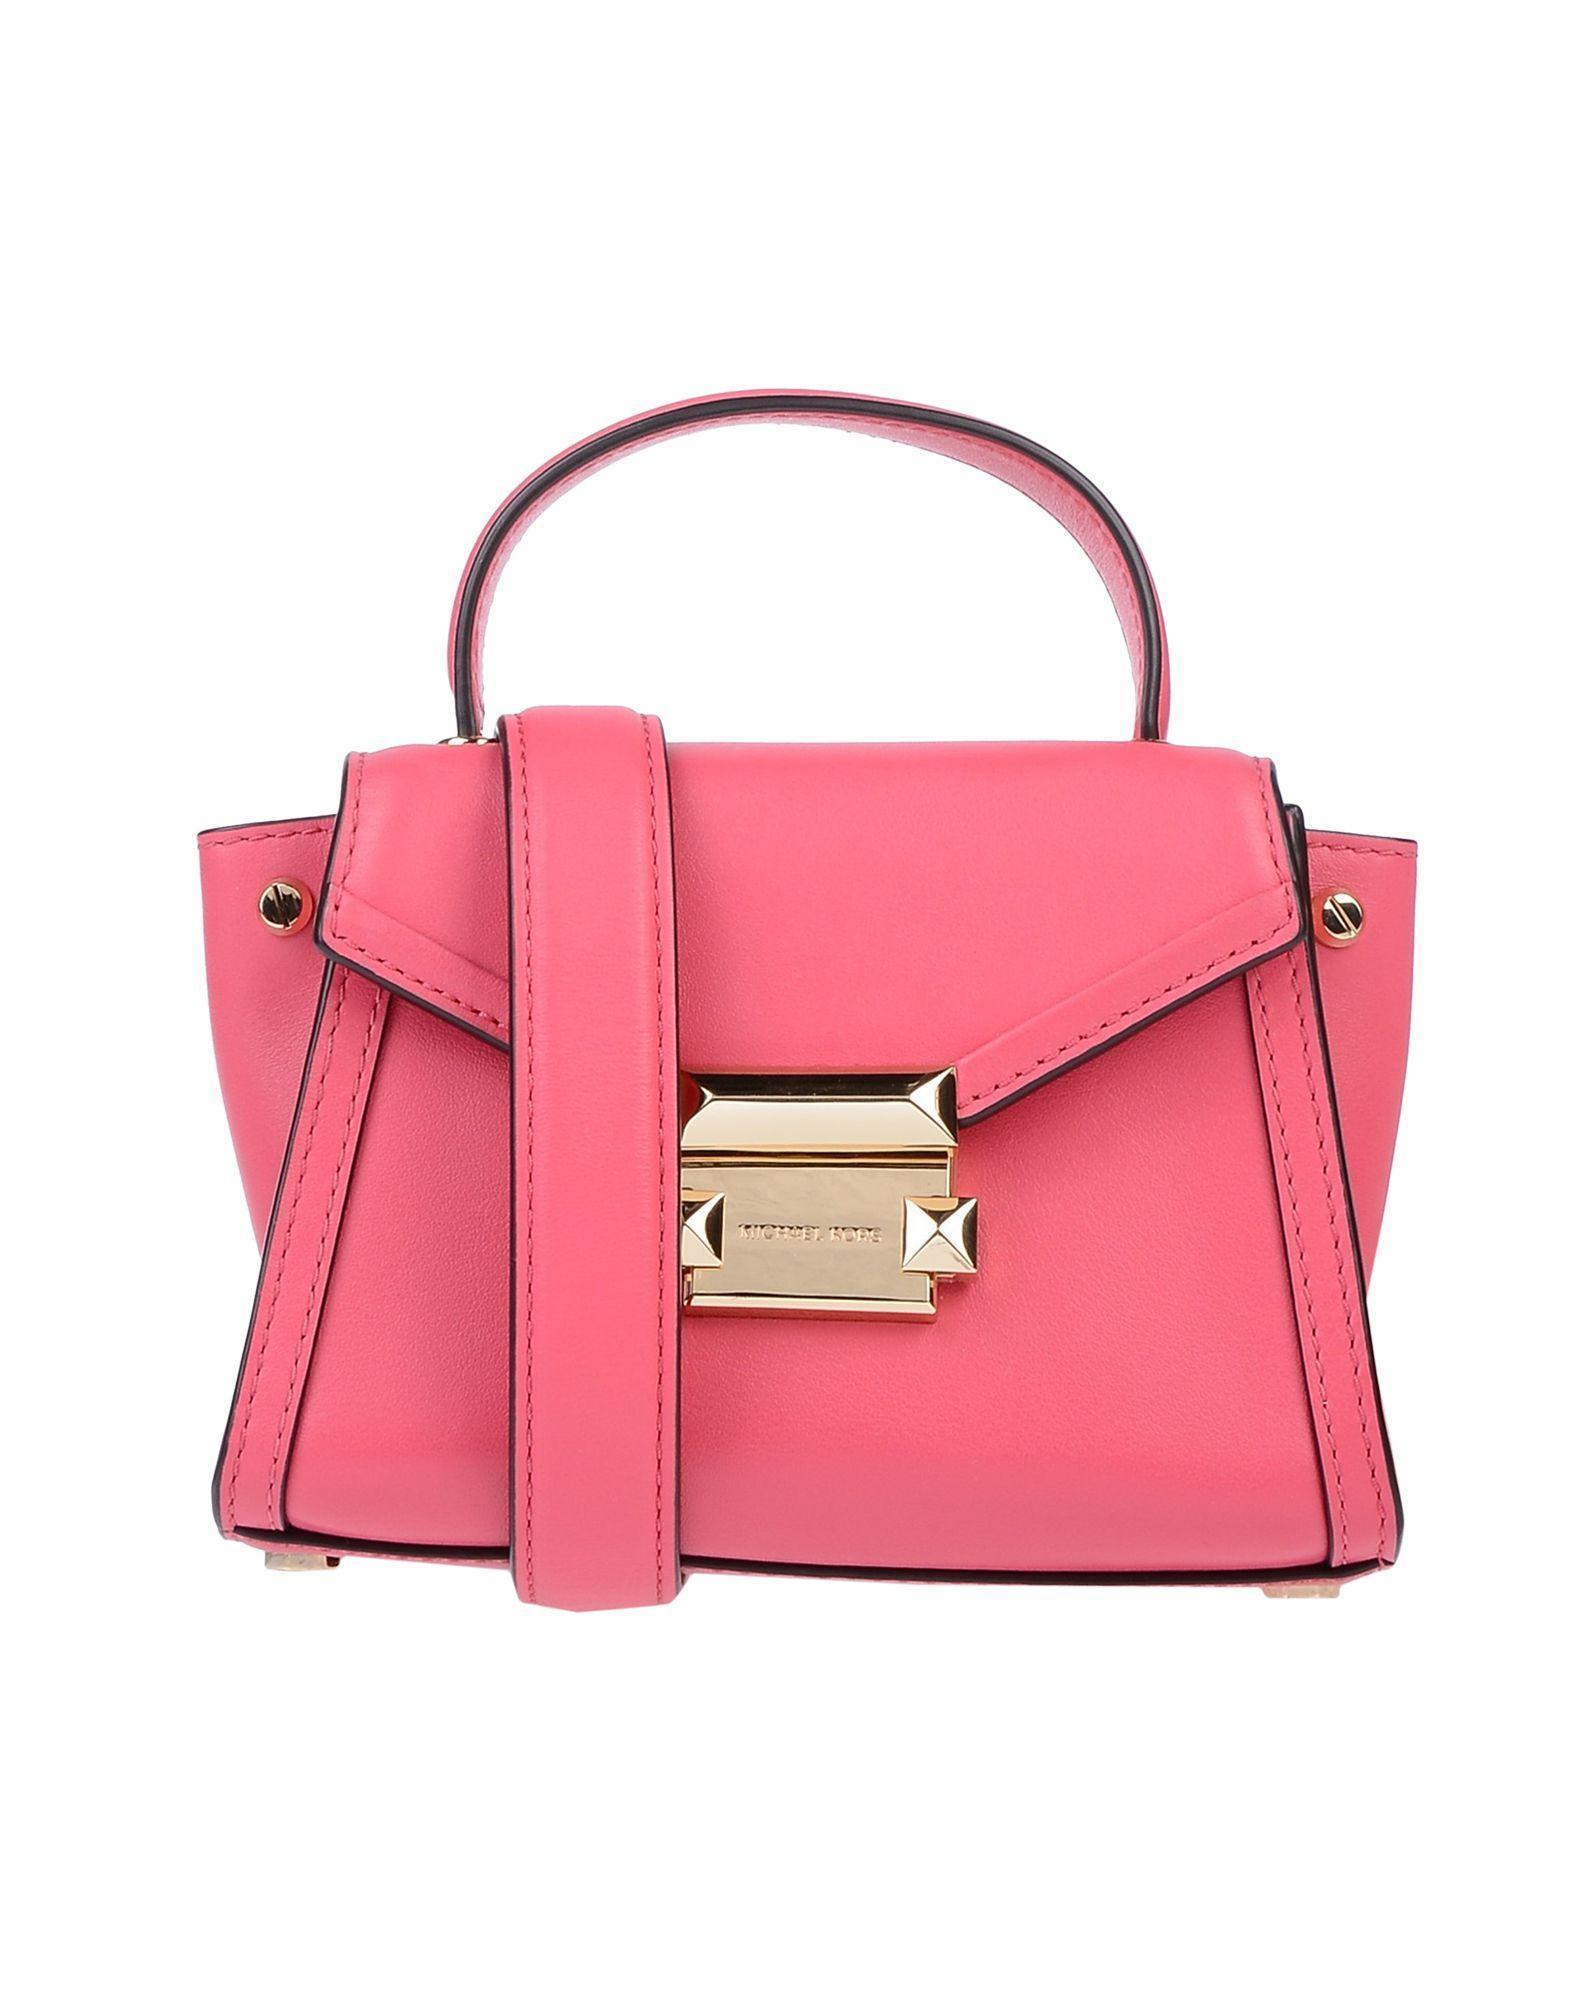 0fafbfaab51bec MICHAEL Michael Kors Handbag in Pink - Lyst